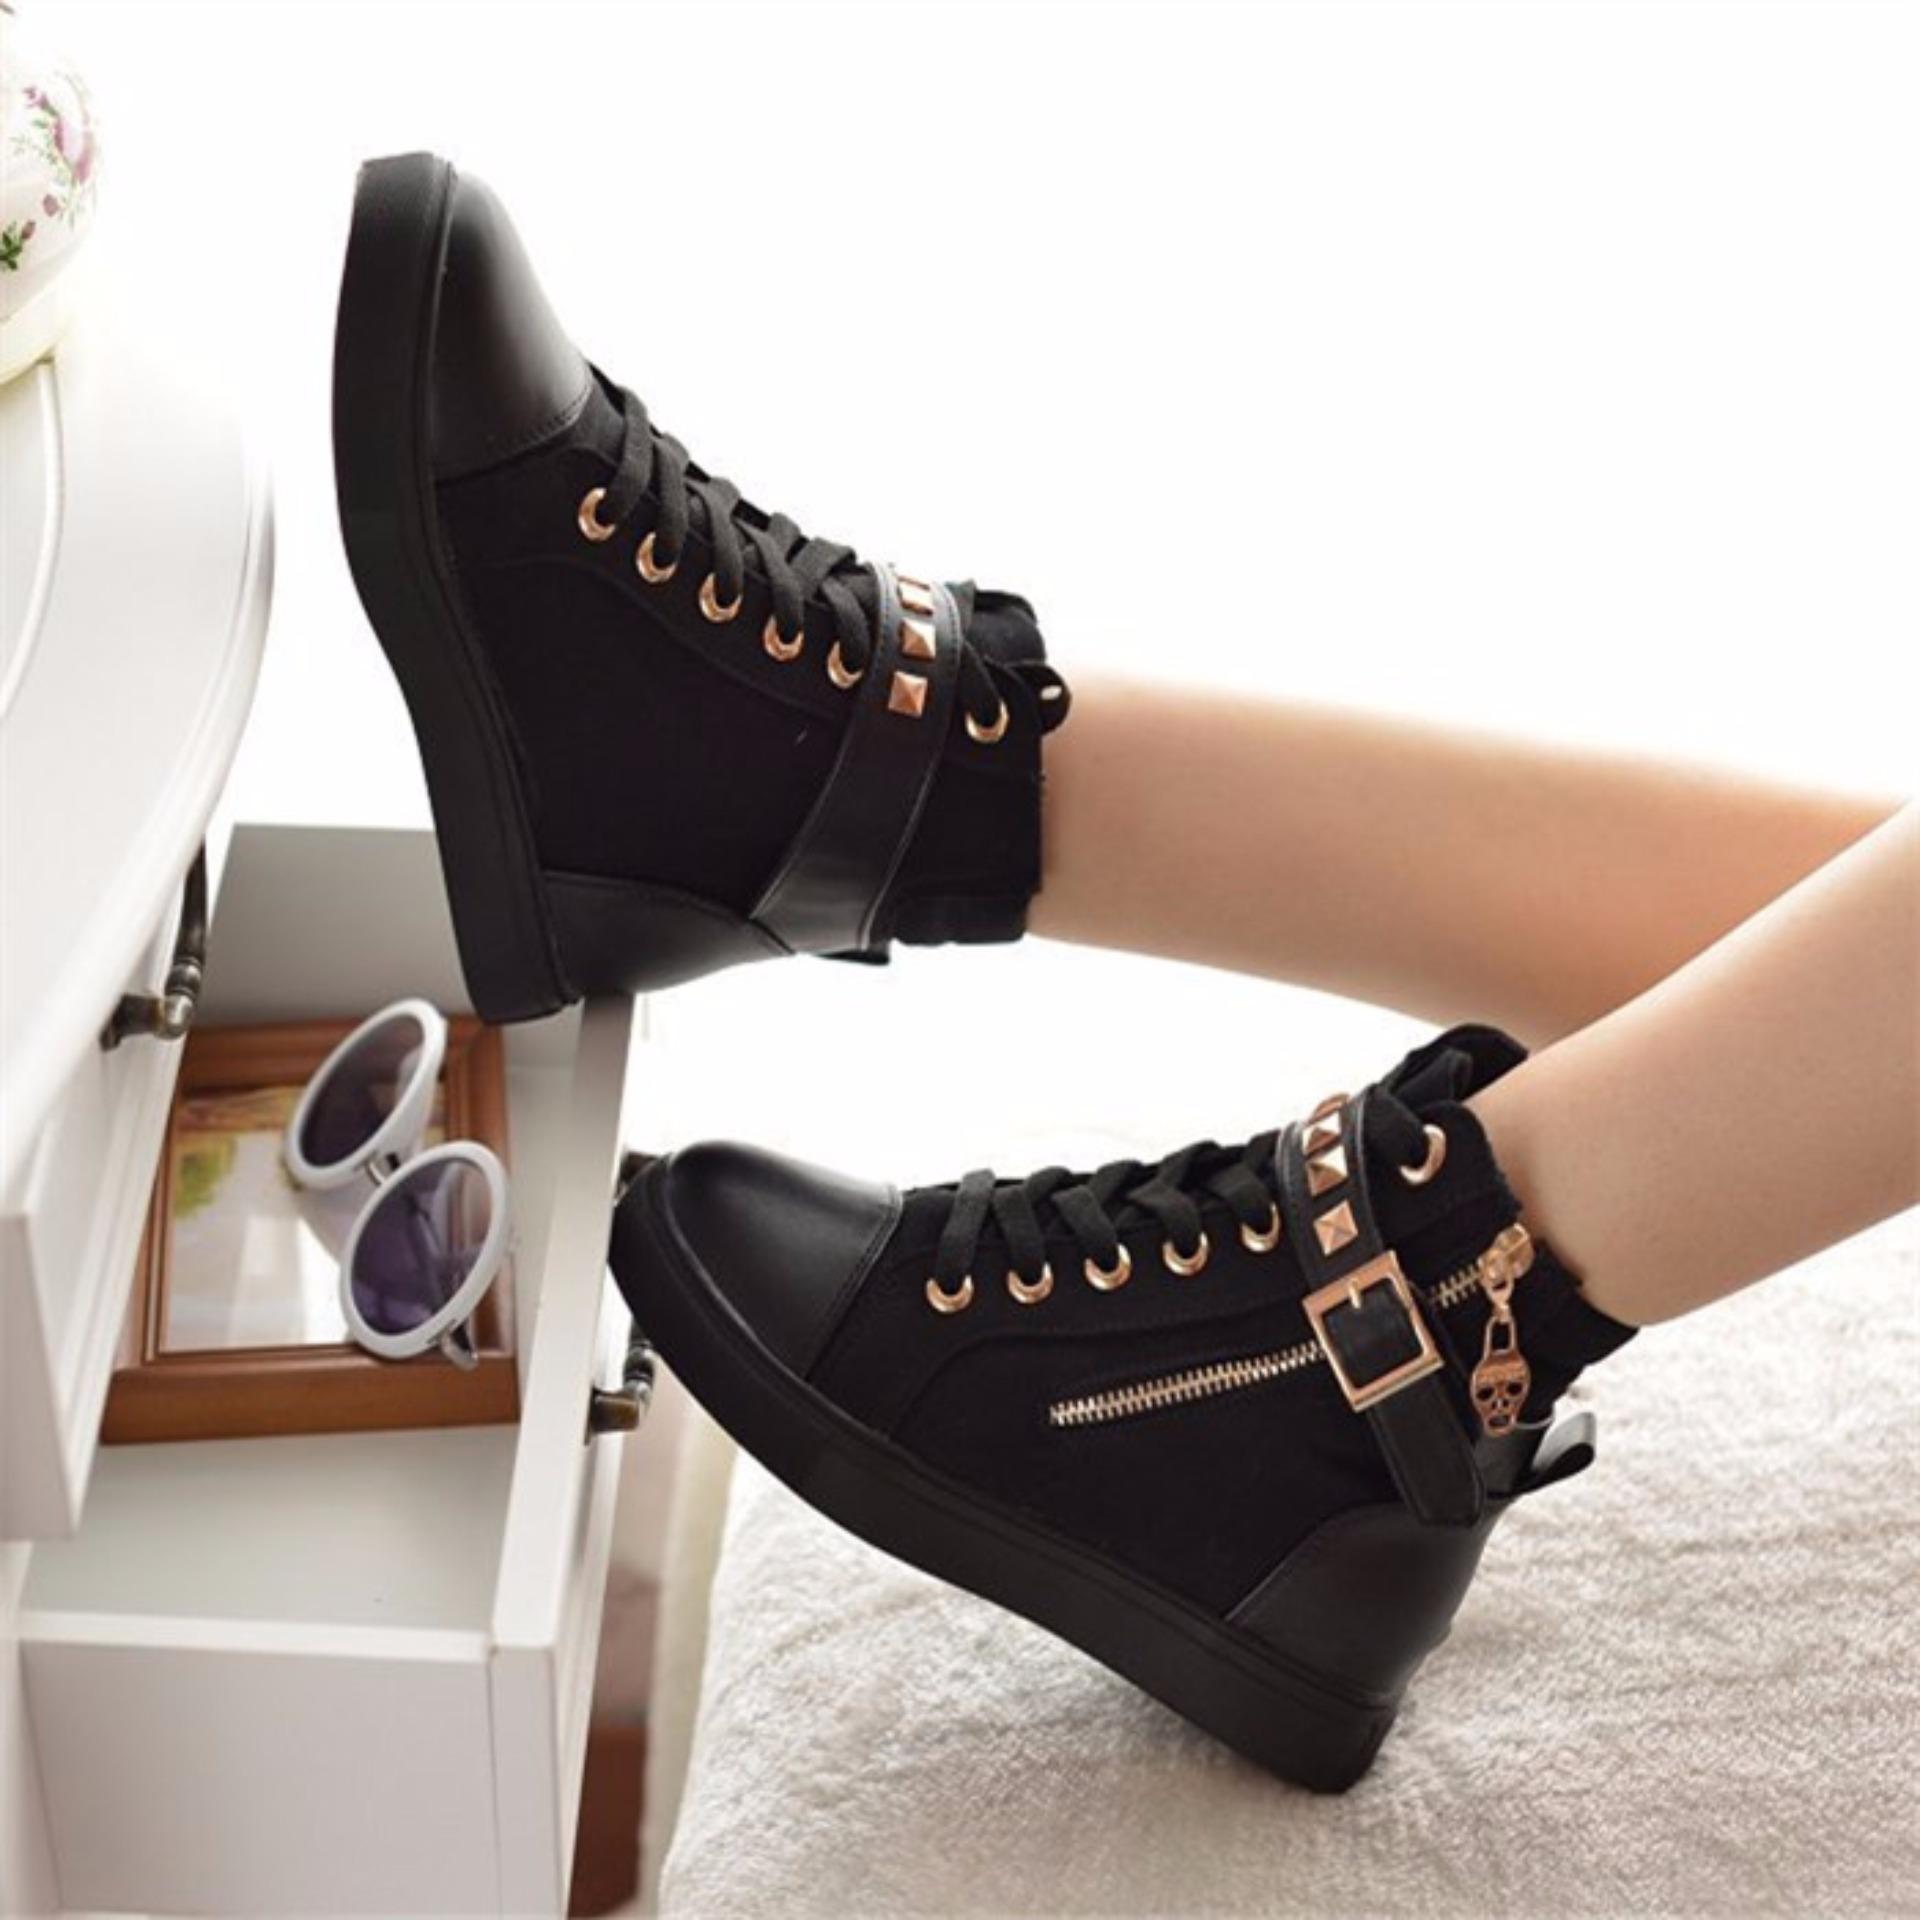 Giày sneaker nữ cổ cao nạm kim loại MSP 2109 (Đen)